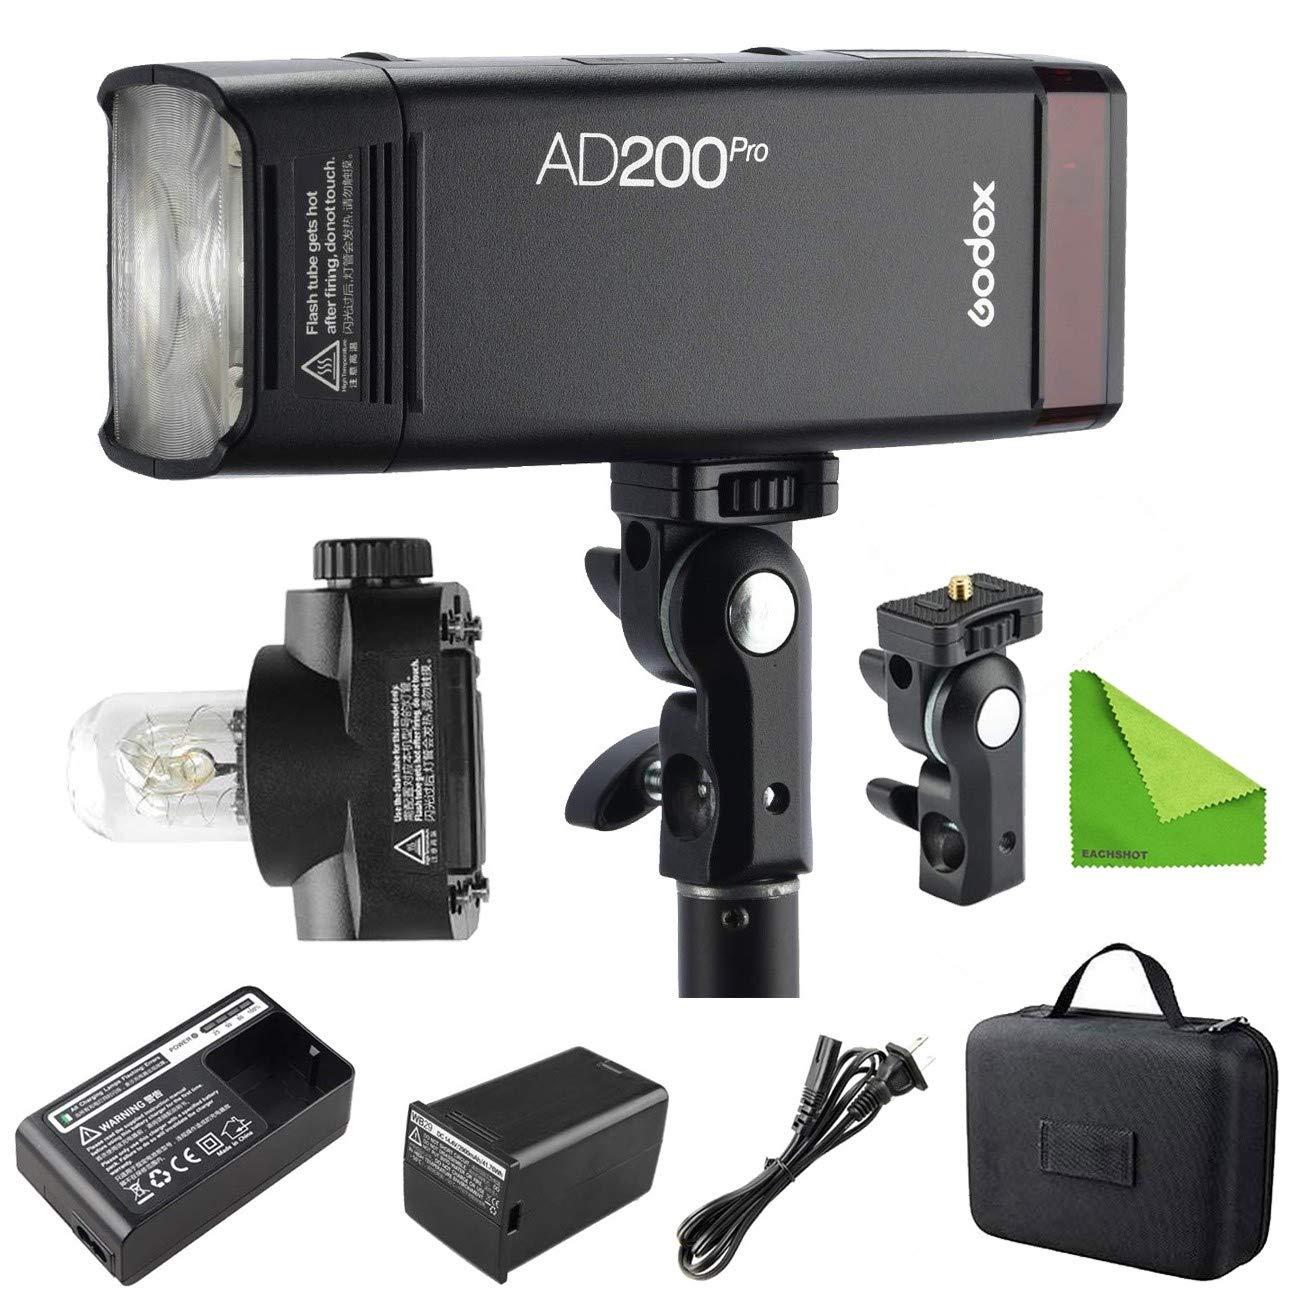 Godox AD200 Pro AD200Pro 200Ws 2.4G Flash Strobe, 1/8000 HSS, 500 Full Power Flashes, 0.01-2.1s Recycling, 2900mAh Battery, Bare Bulb/Speedlite Fresnel Flash Head by Godox